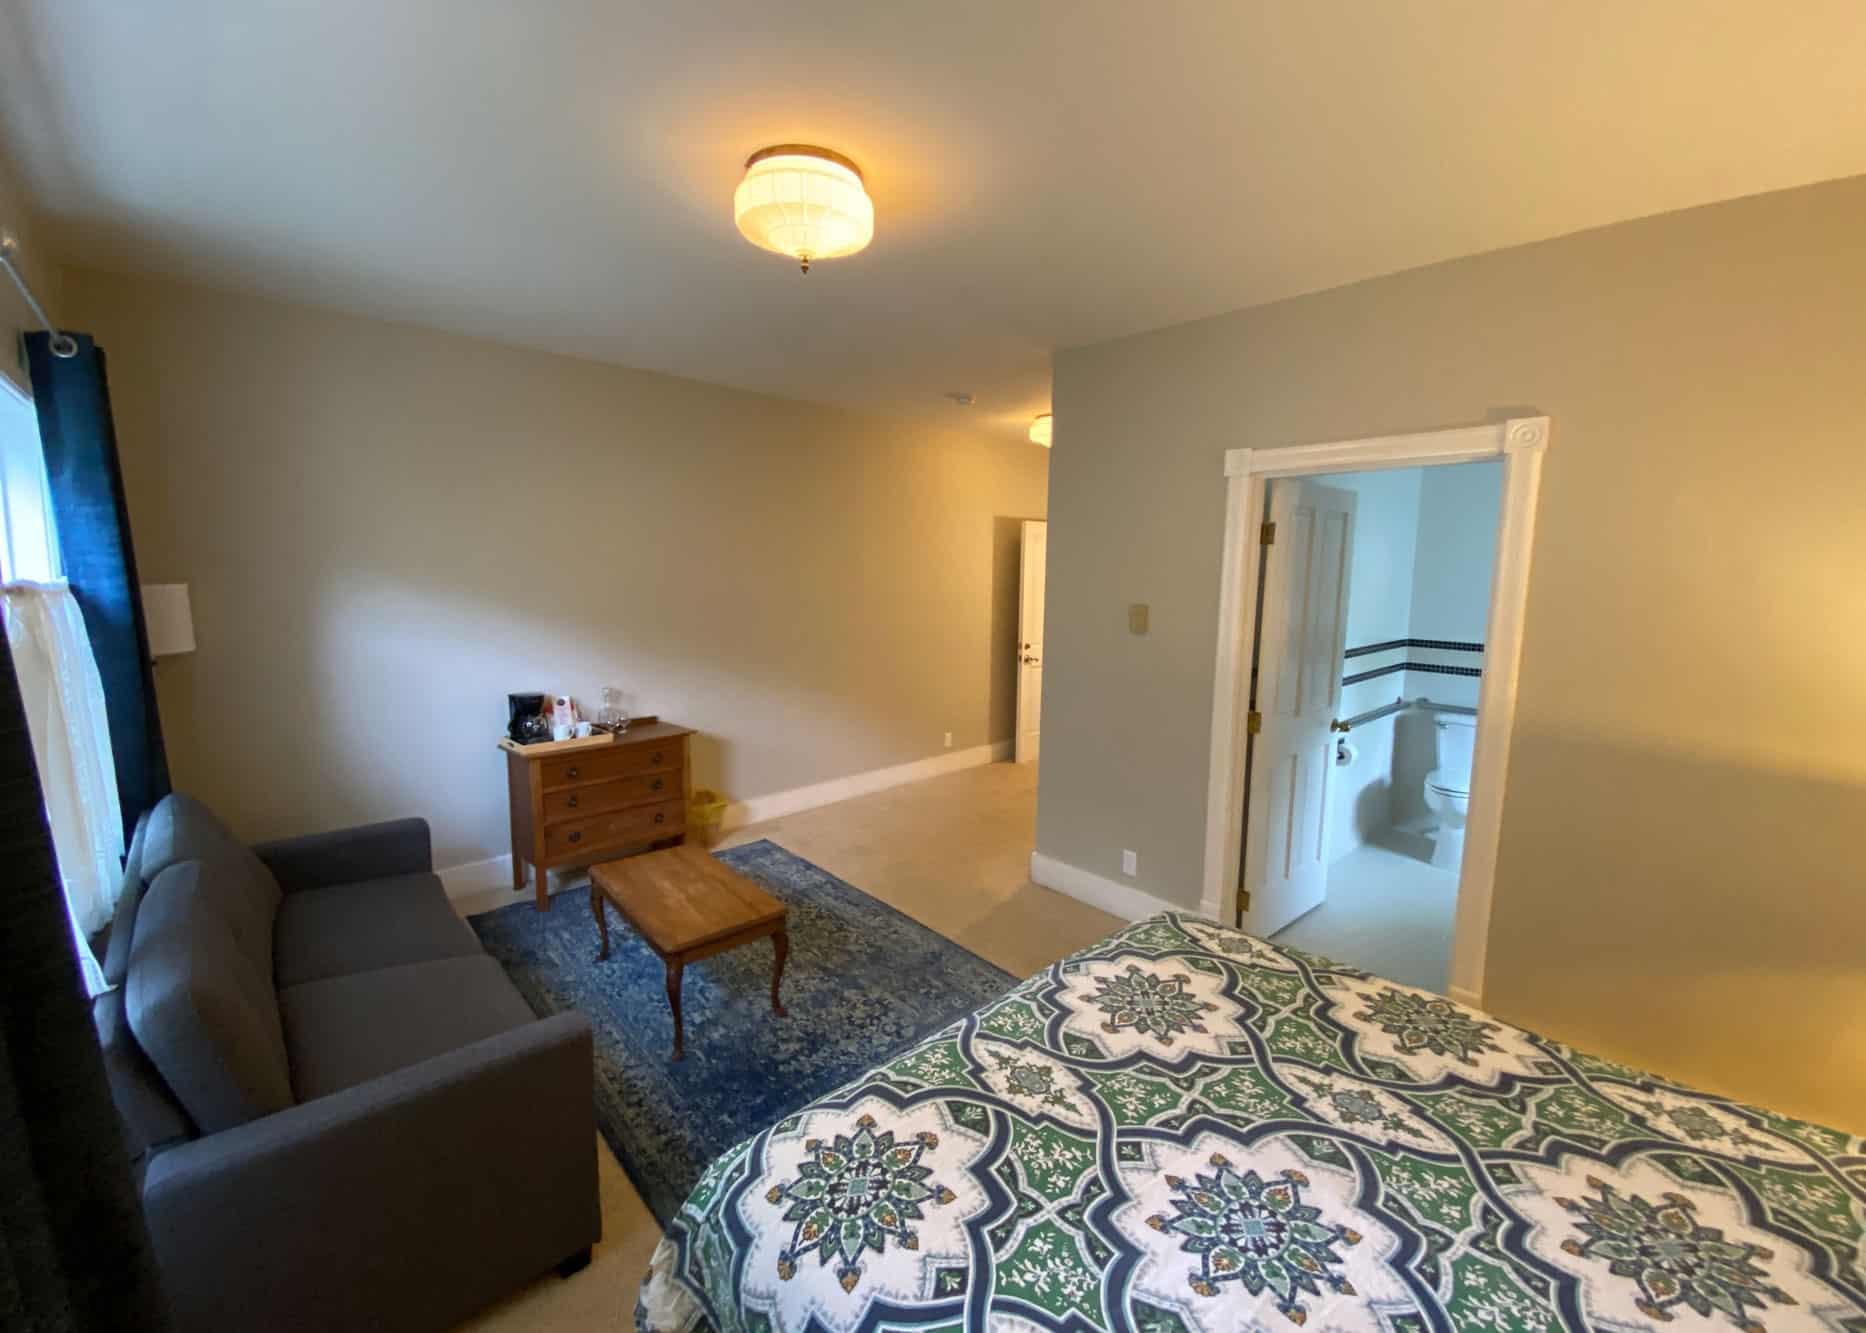 the-edenwild-inn-lopez-island-lodging-2020-room-03-02